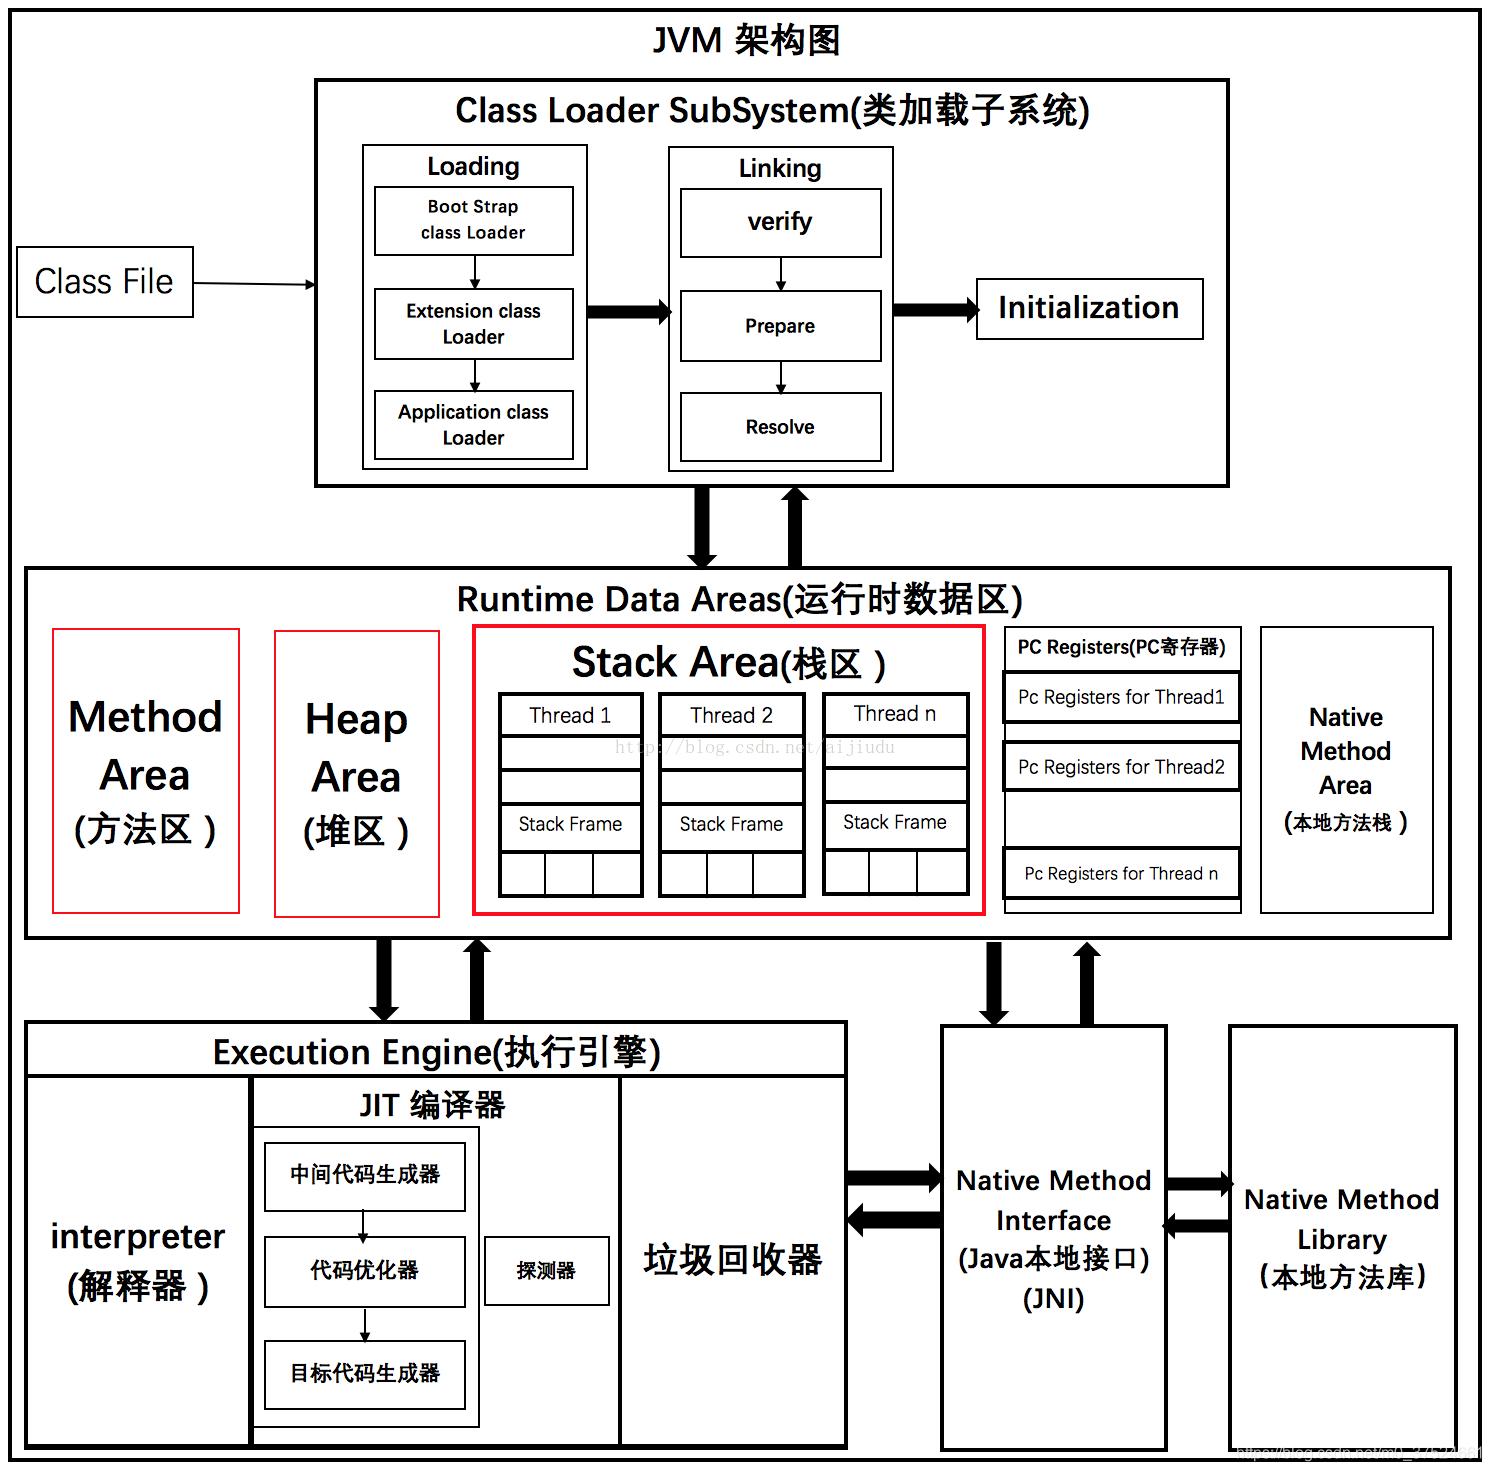 JVM的架构图